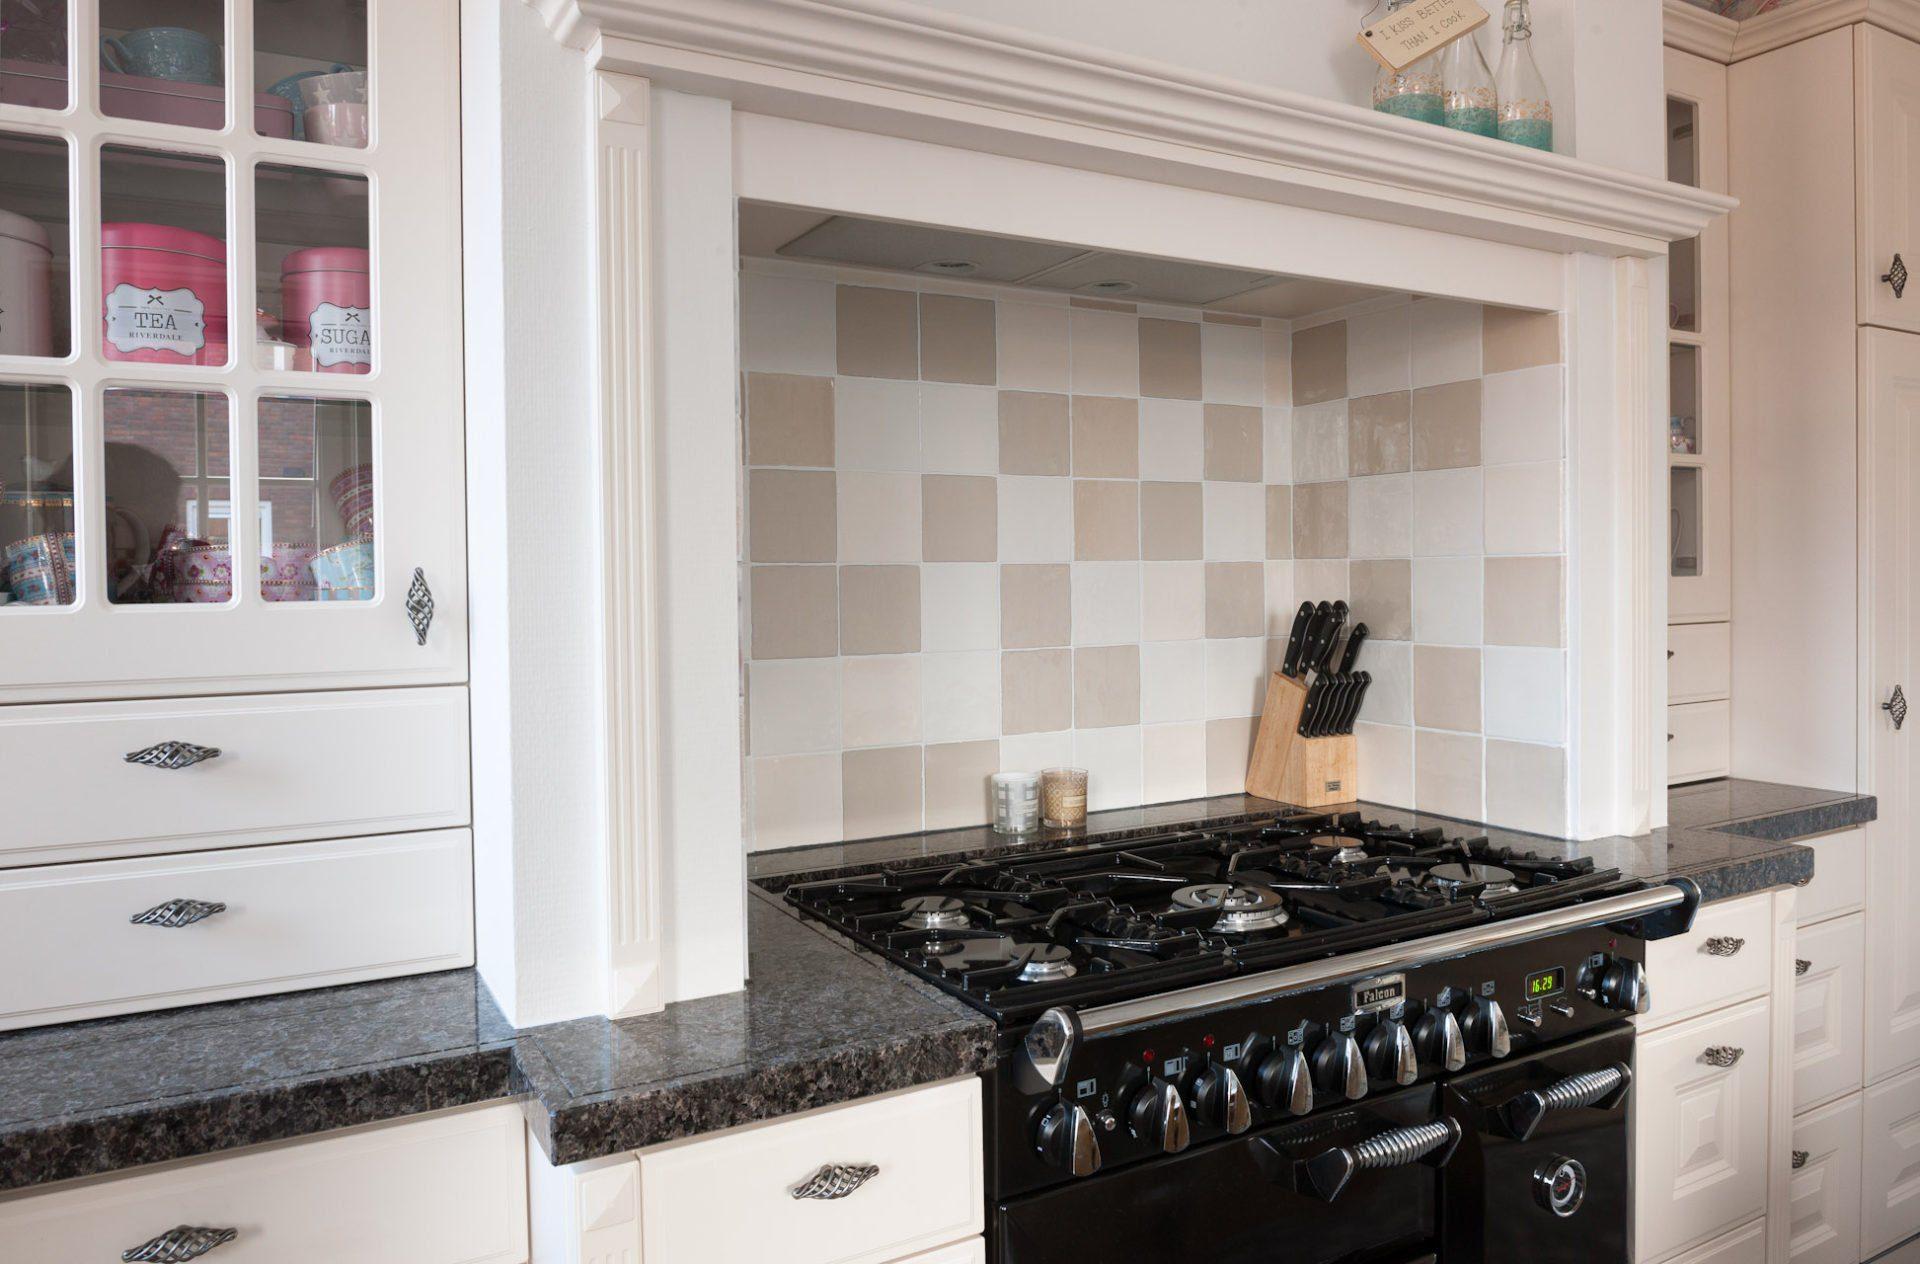 Patroontegels In Keuken : Houtlook vloer in woonkamer donkere patroontegels in keuken